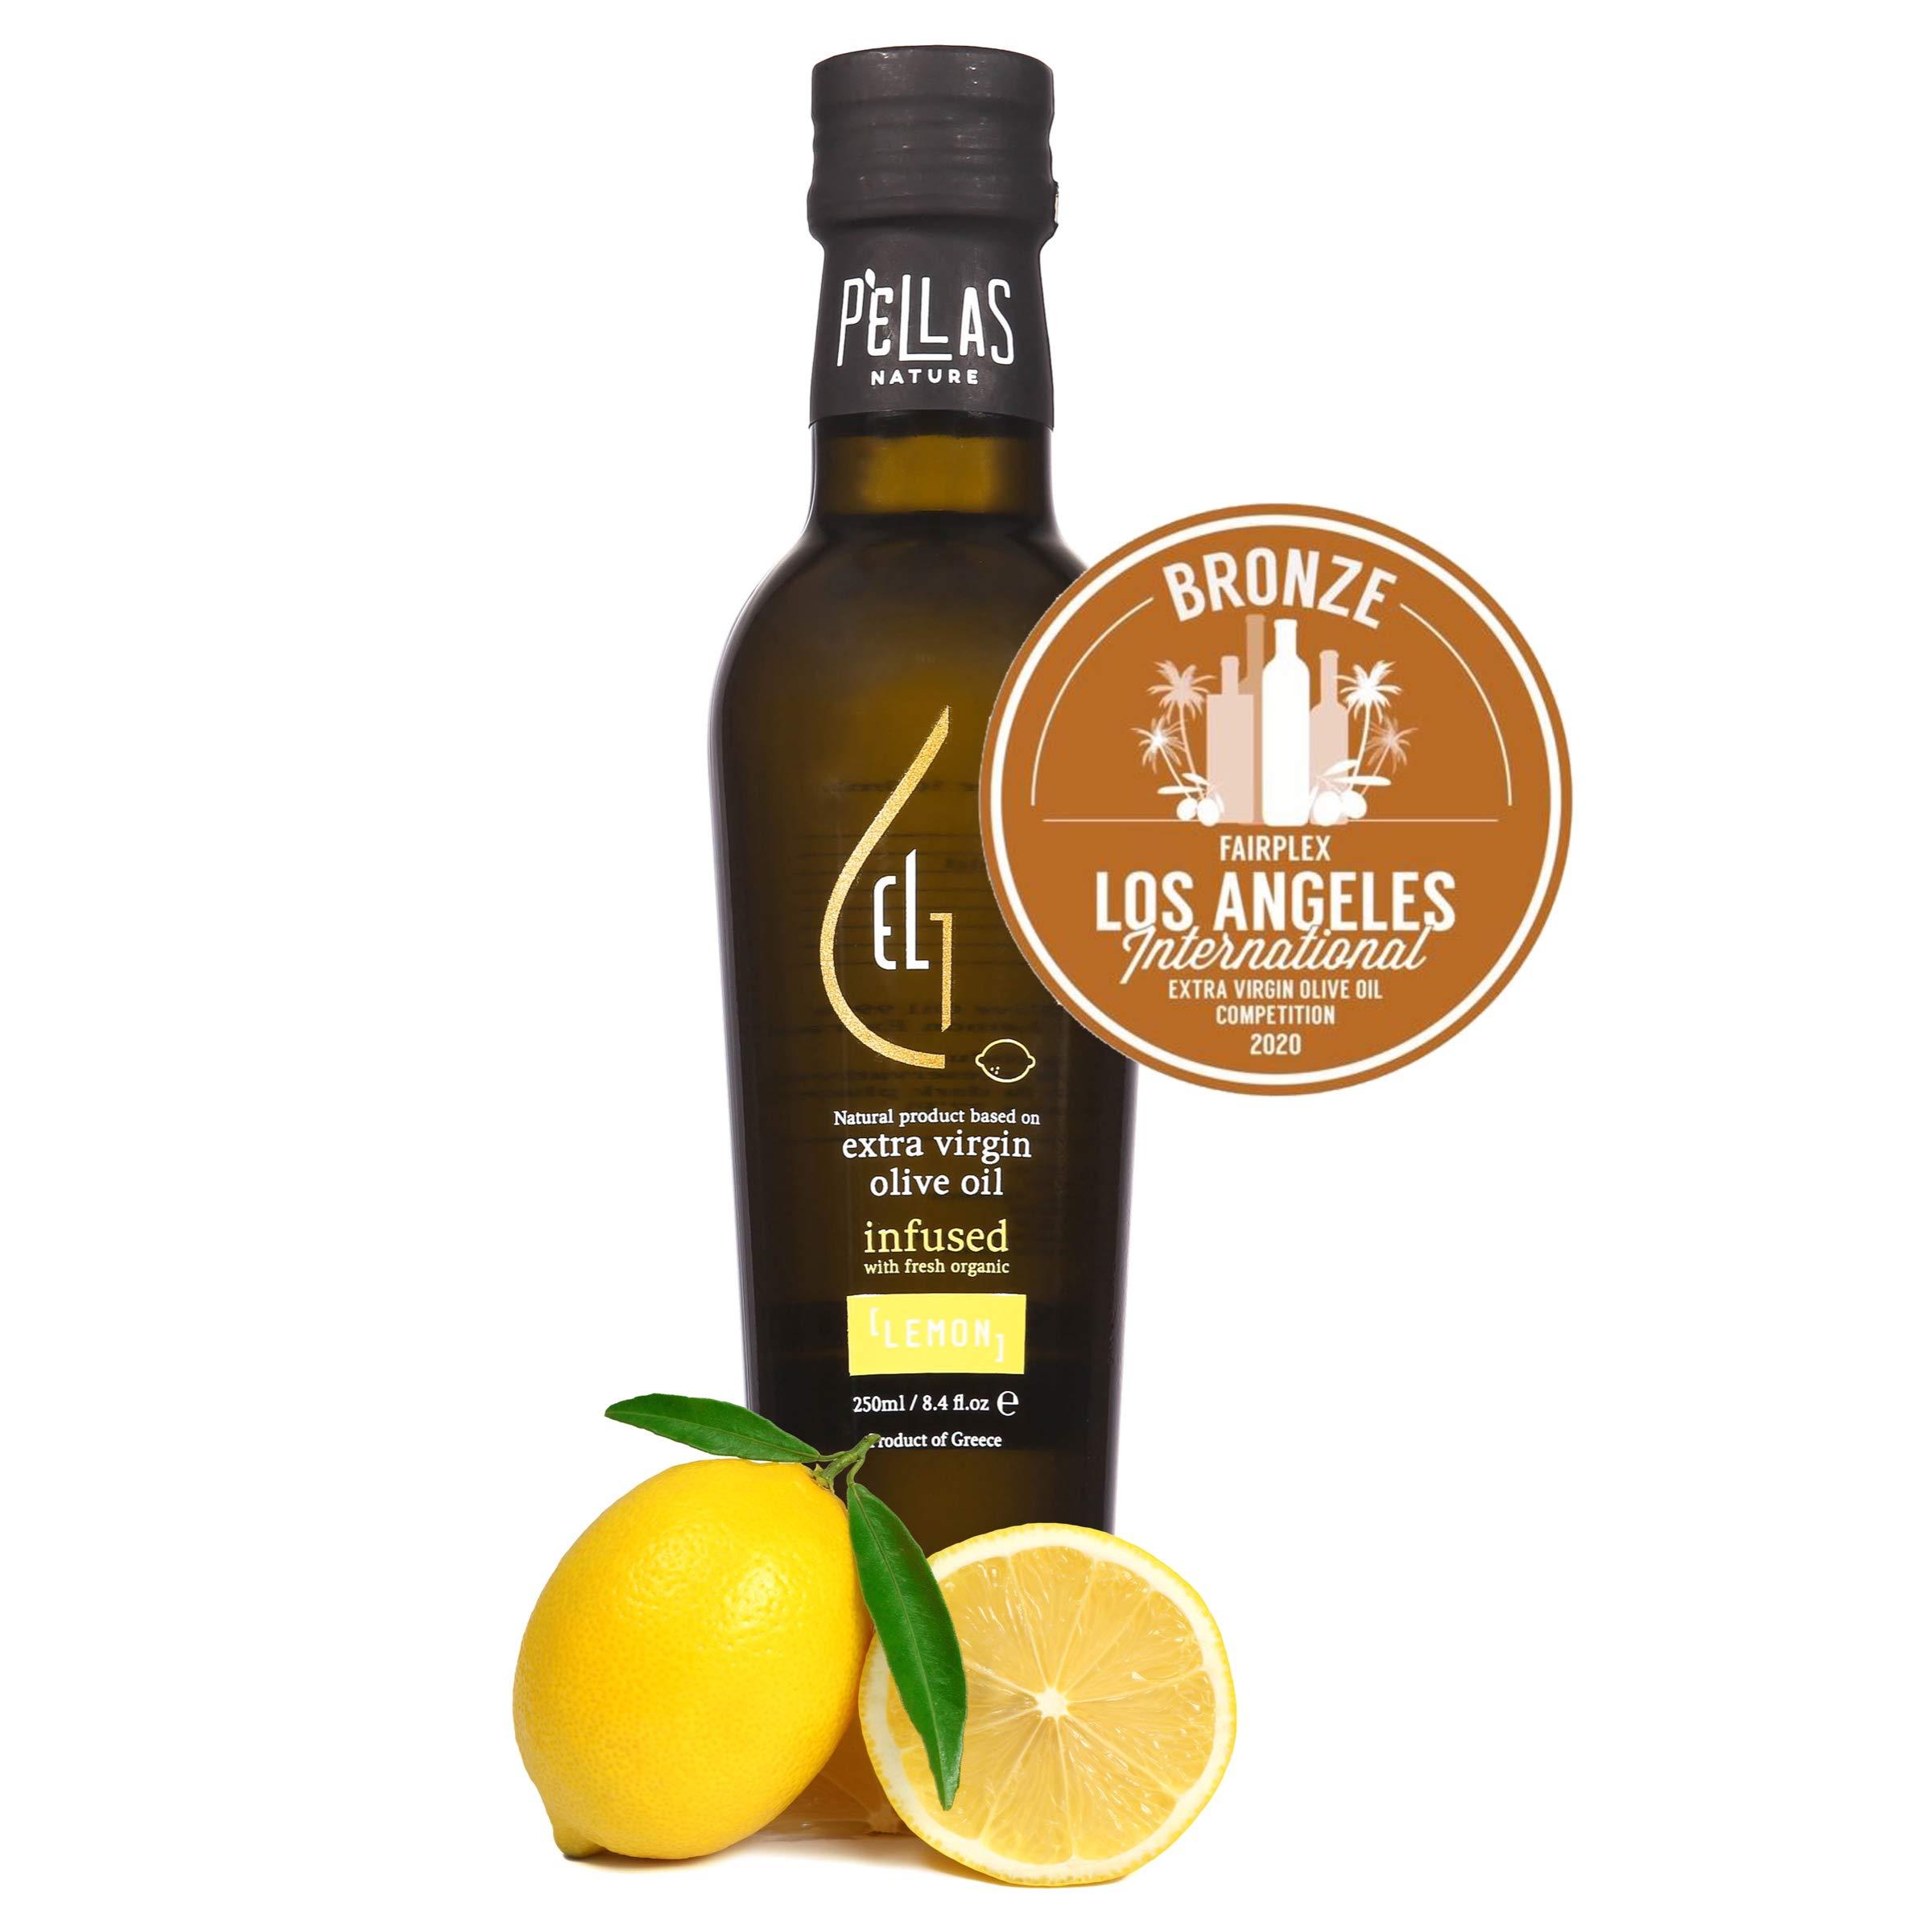 Pellas Nature, fresh organic lemon infused Greek extra virgin olive oil, 2020 award winning, single origin, all natural, no additives, 250 ml dark bottle